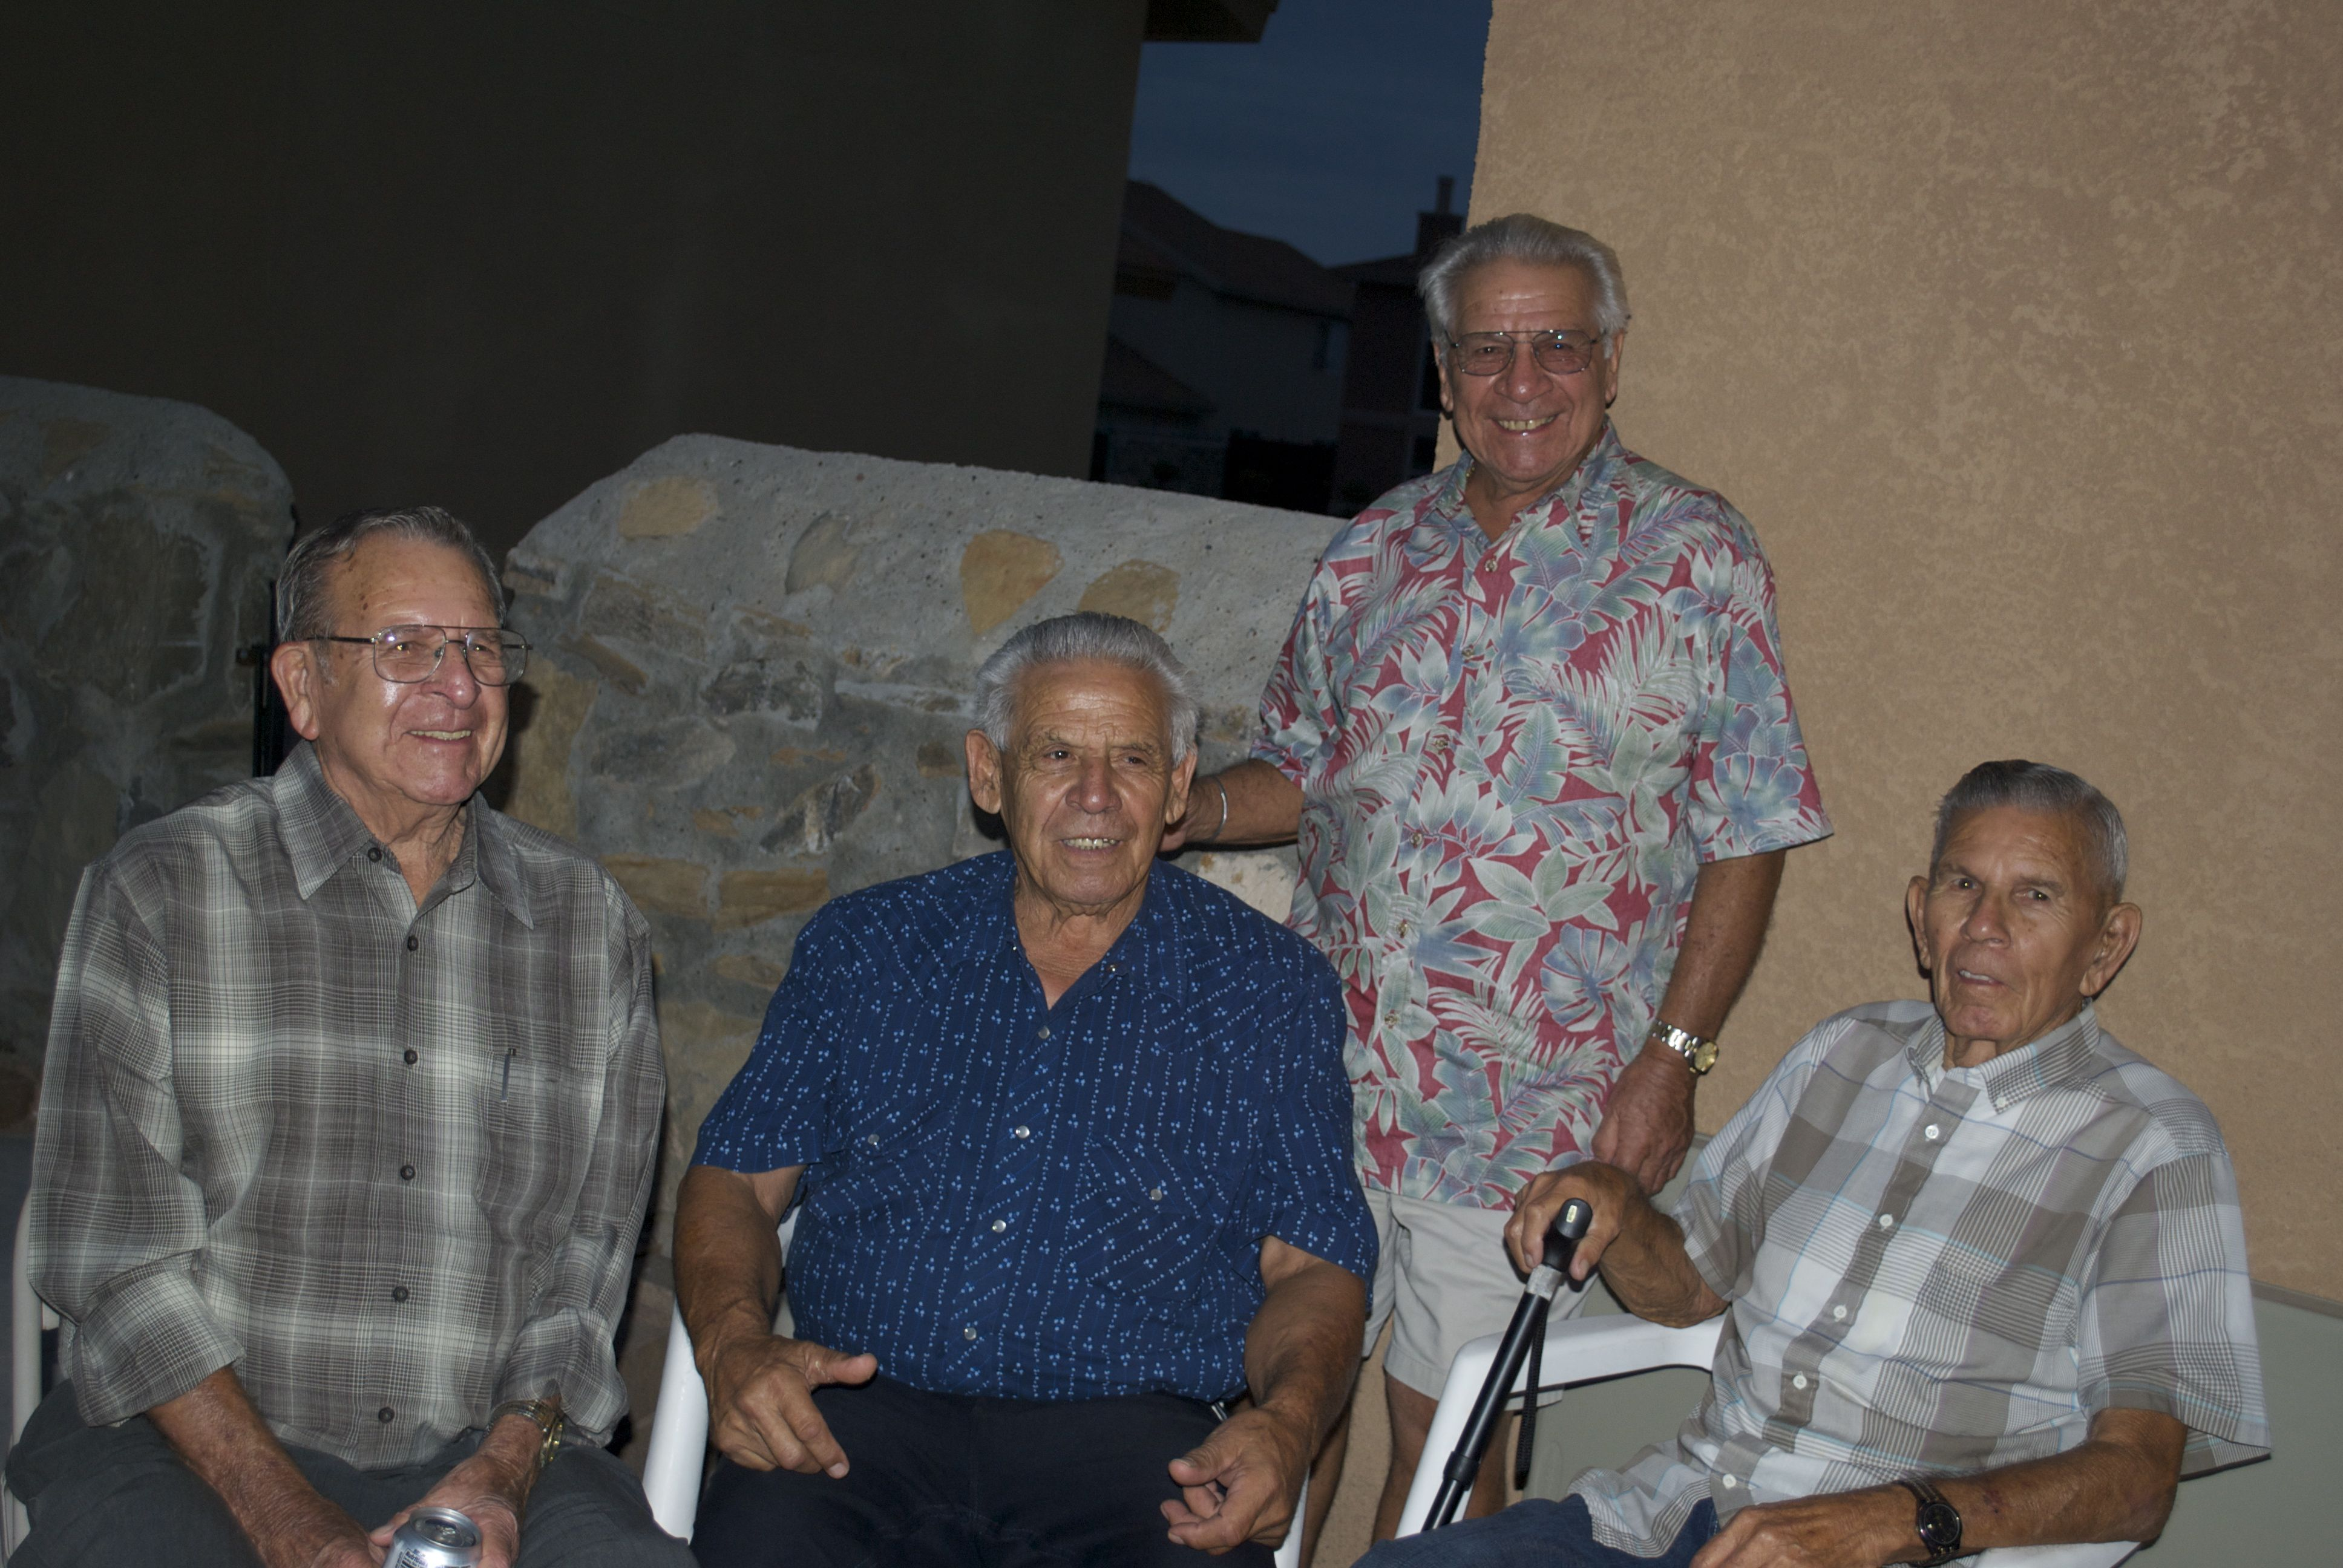 Peter, Roy, George and Louie Stoltz, El Paso, 2013